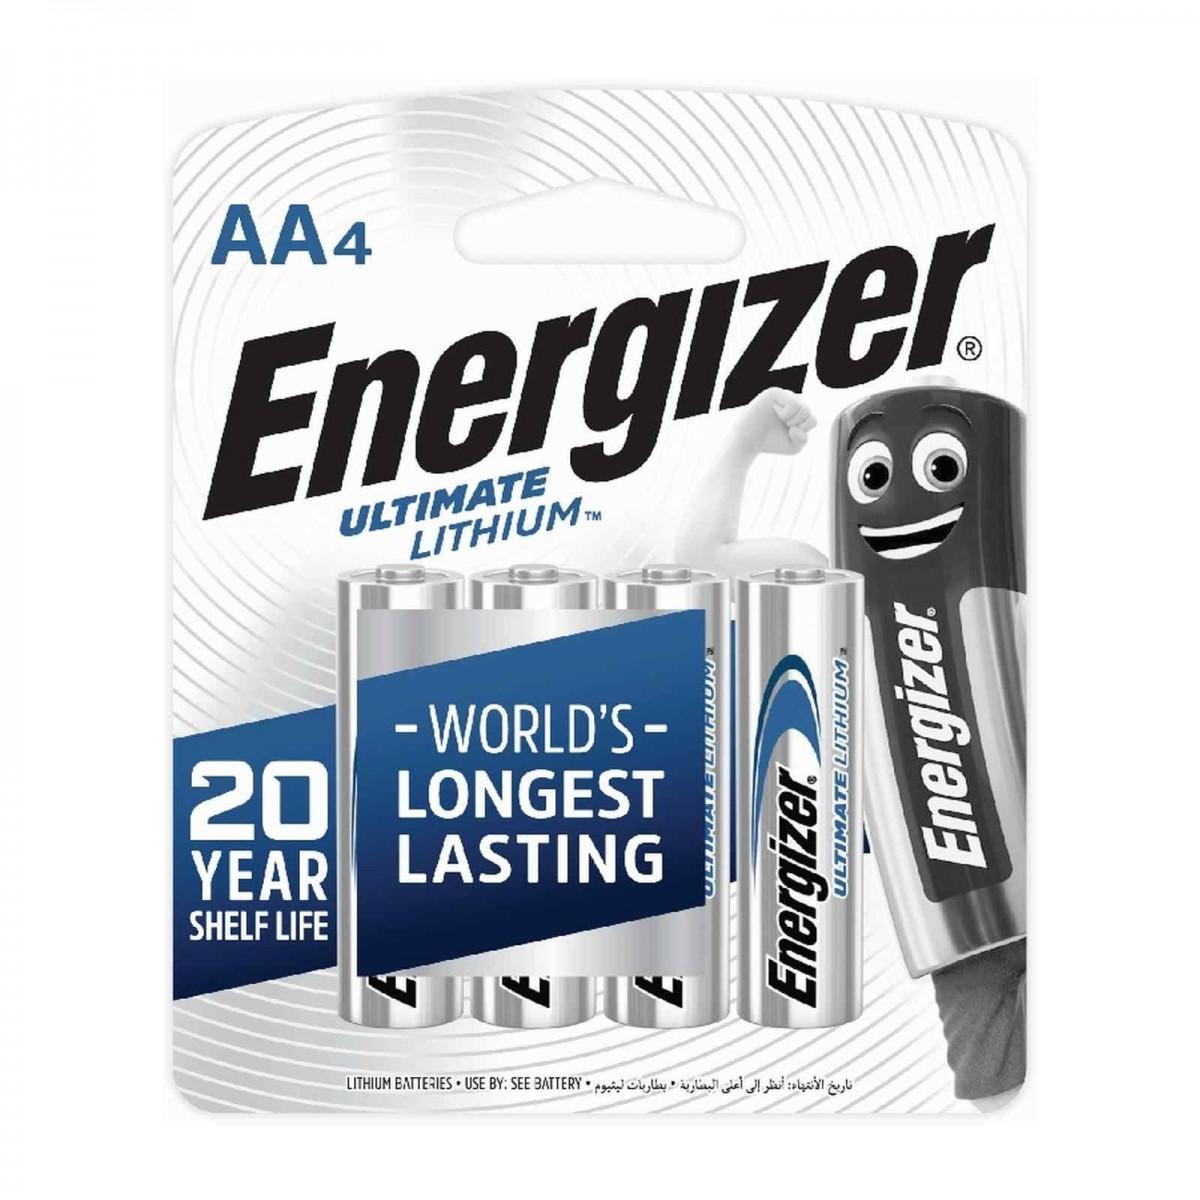 Energizer Ultimate Lithium AA Battery 4pcs